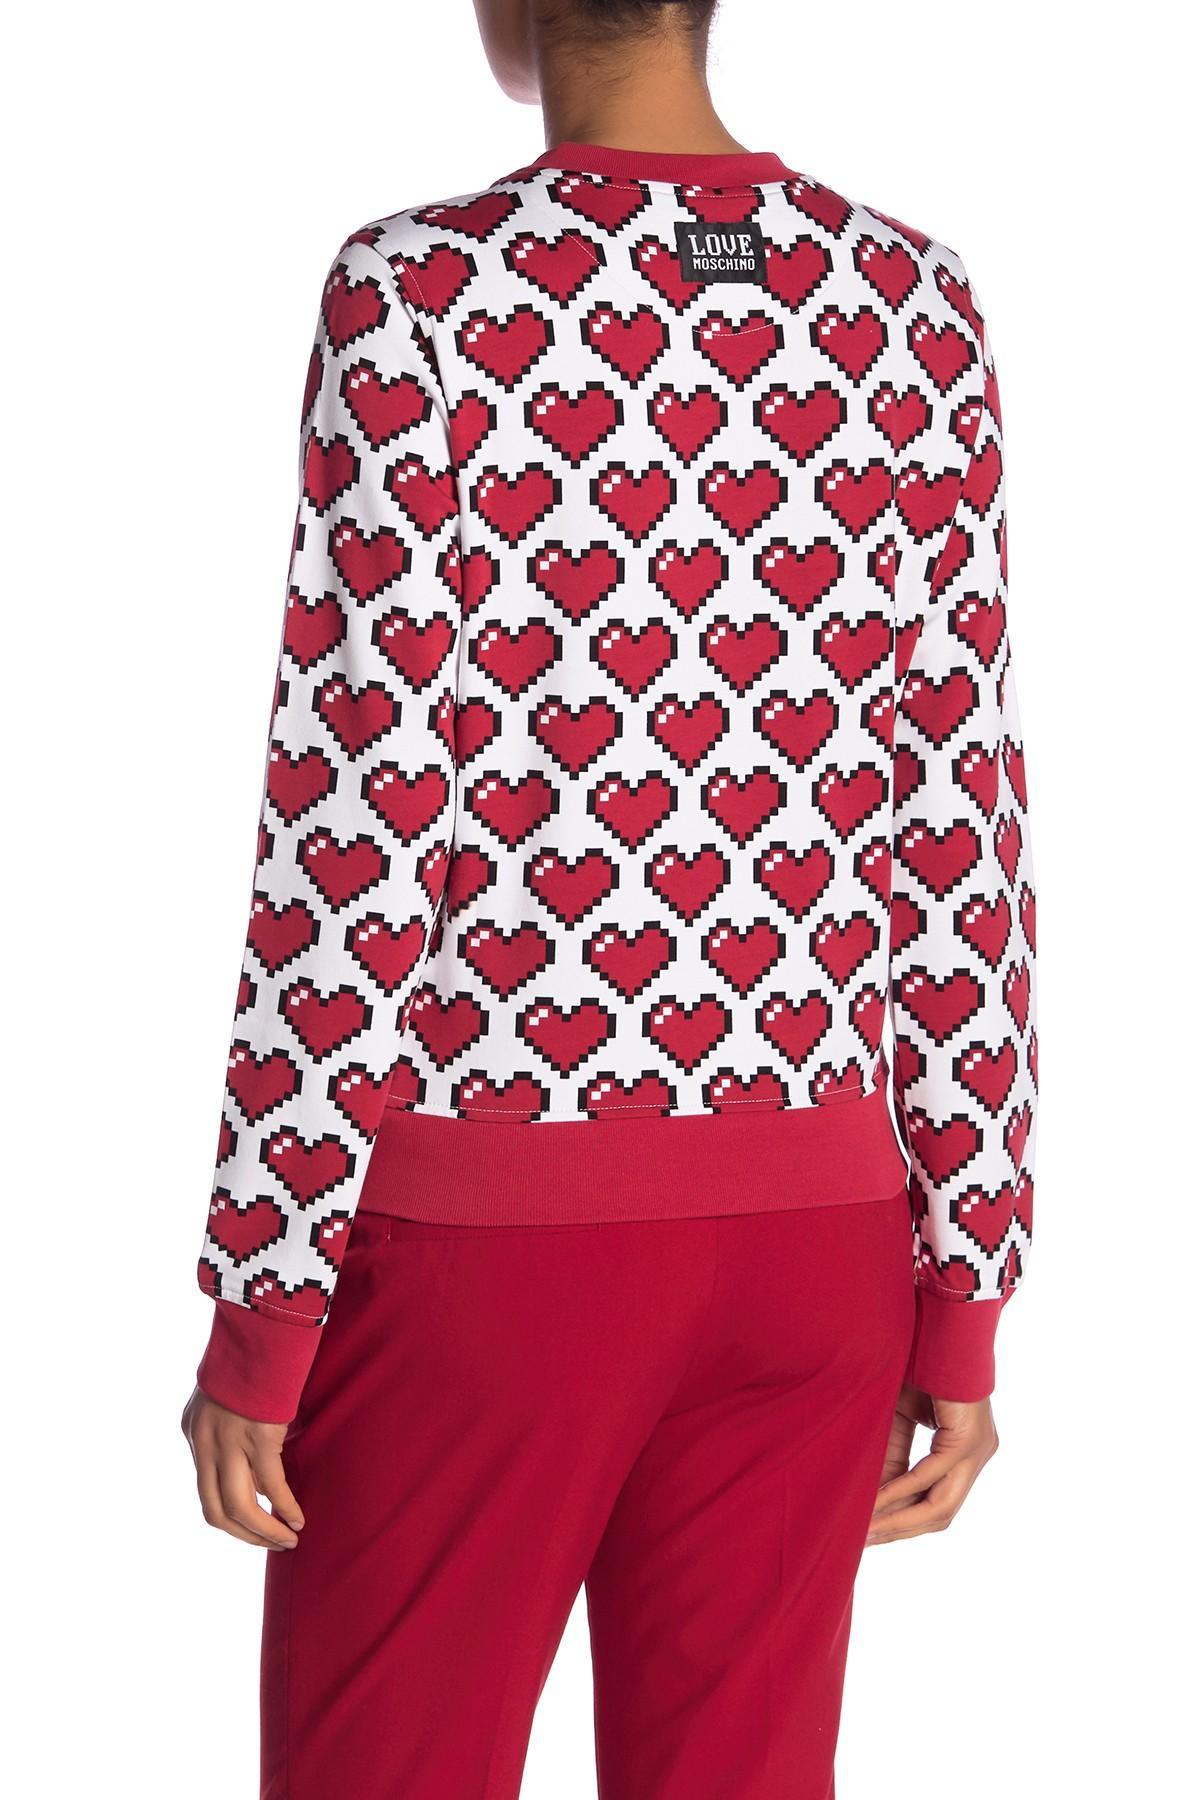 Love Lyst Pullover Felpa Moschino Girocollo Red In SwwqzCxd4